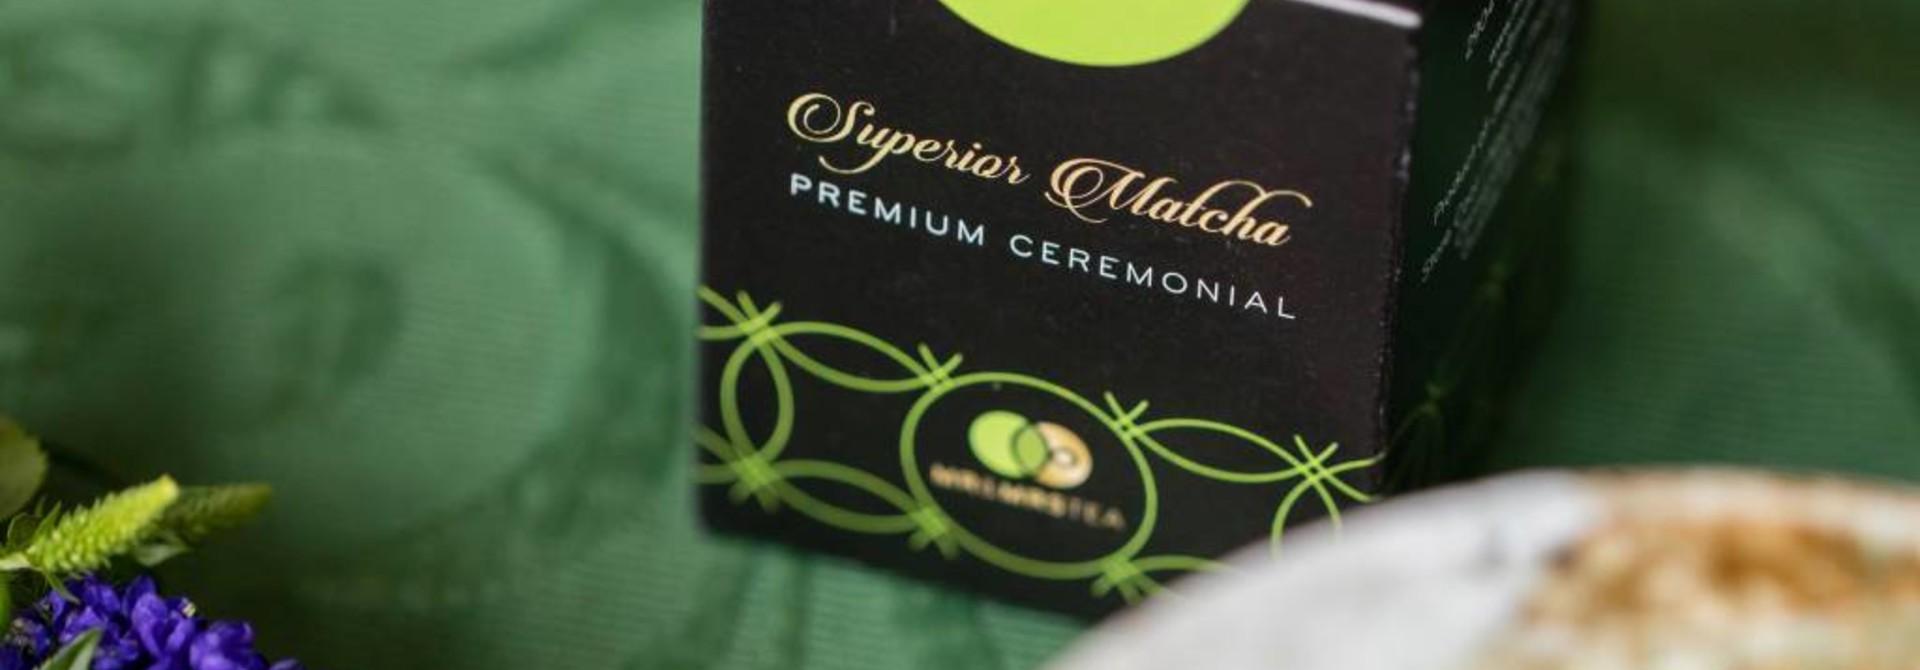 Superior Matcha Premium Ceremonial ★★ Om elke dag gezond te beginnen